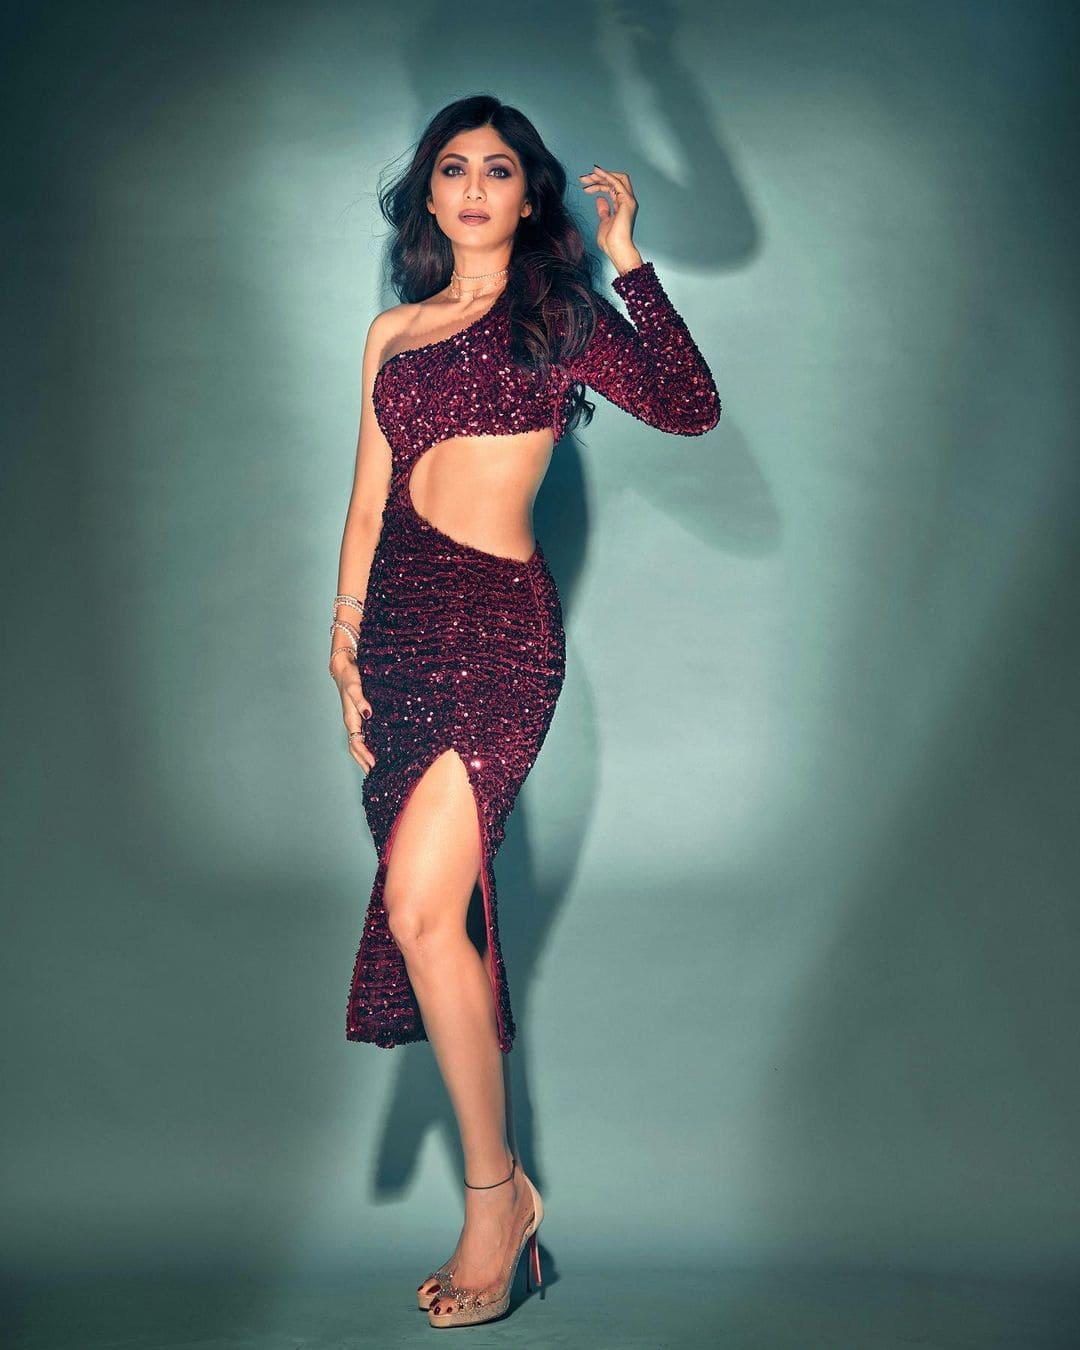 Raj Kundra Porn Case Shilpa Shetty Financial Losses